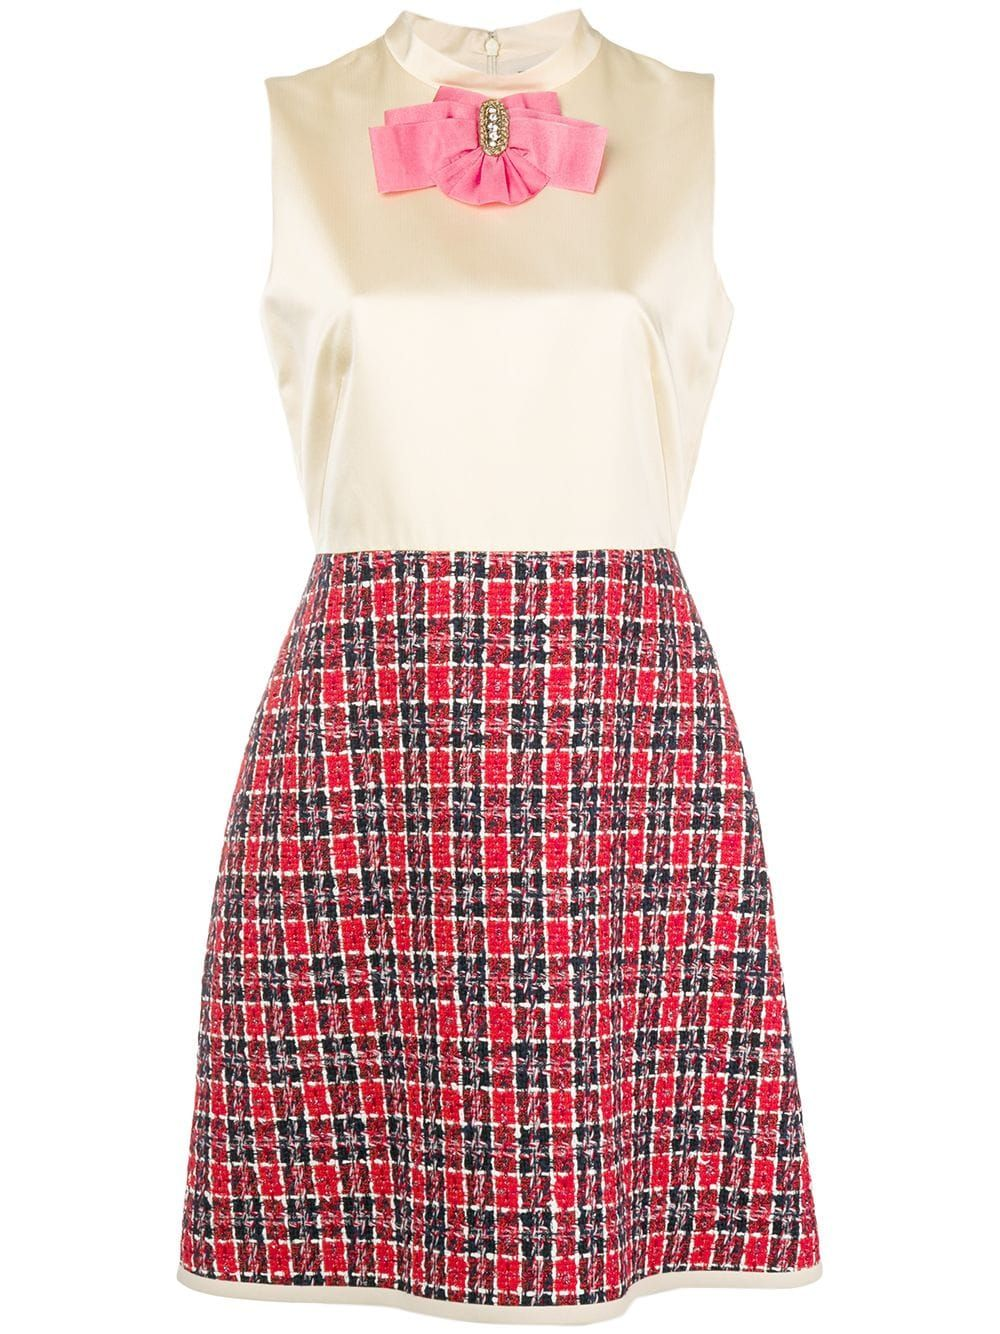 Gucci Bow Tweed Skirt Dress – Farfetch